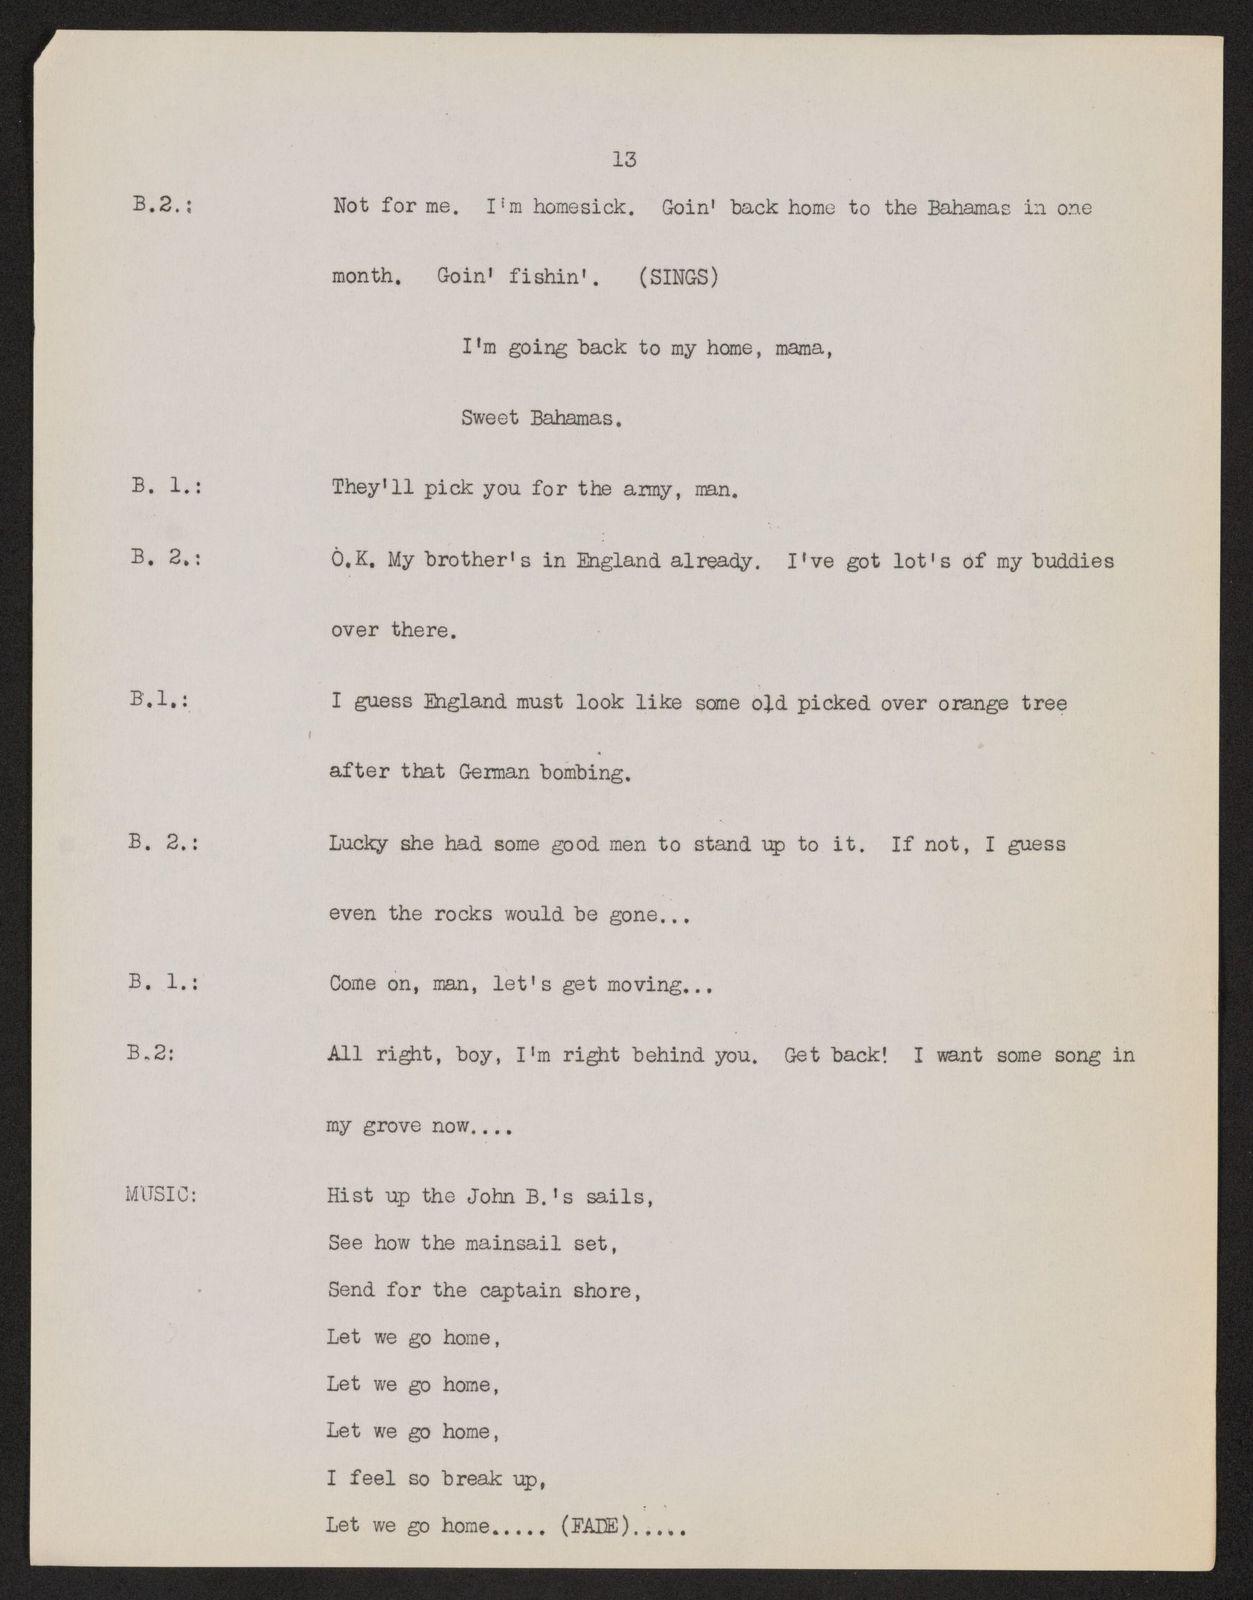 Alan Lomax Collection, Manuscripts, CBS-BBC, 1943, Transatlantic Call--People To People